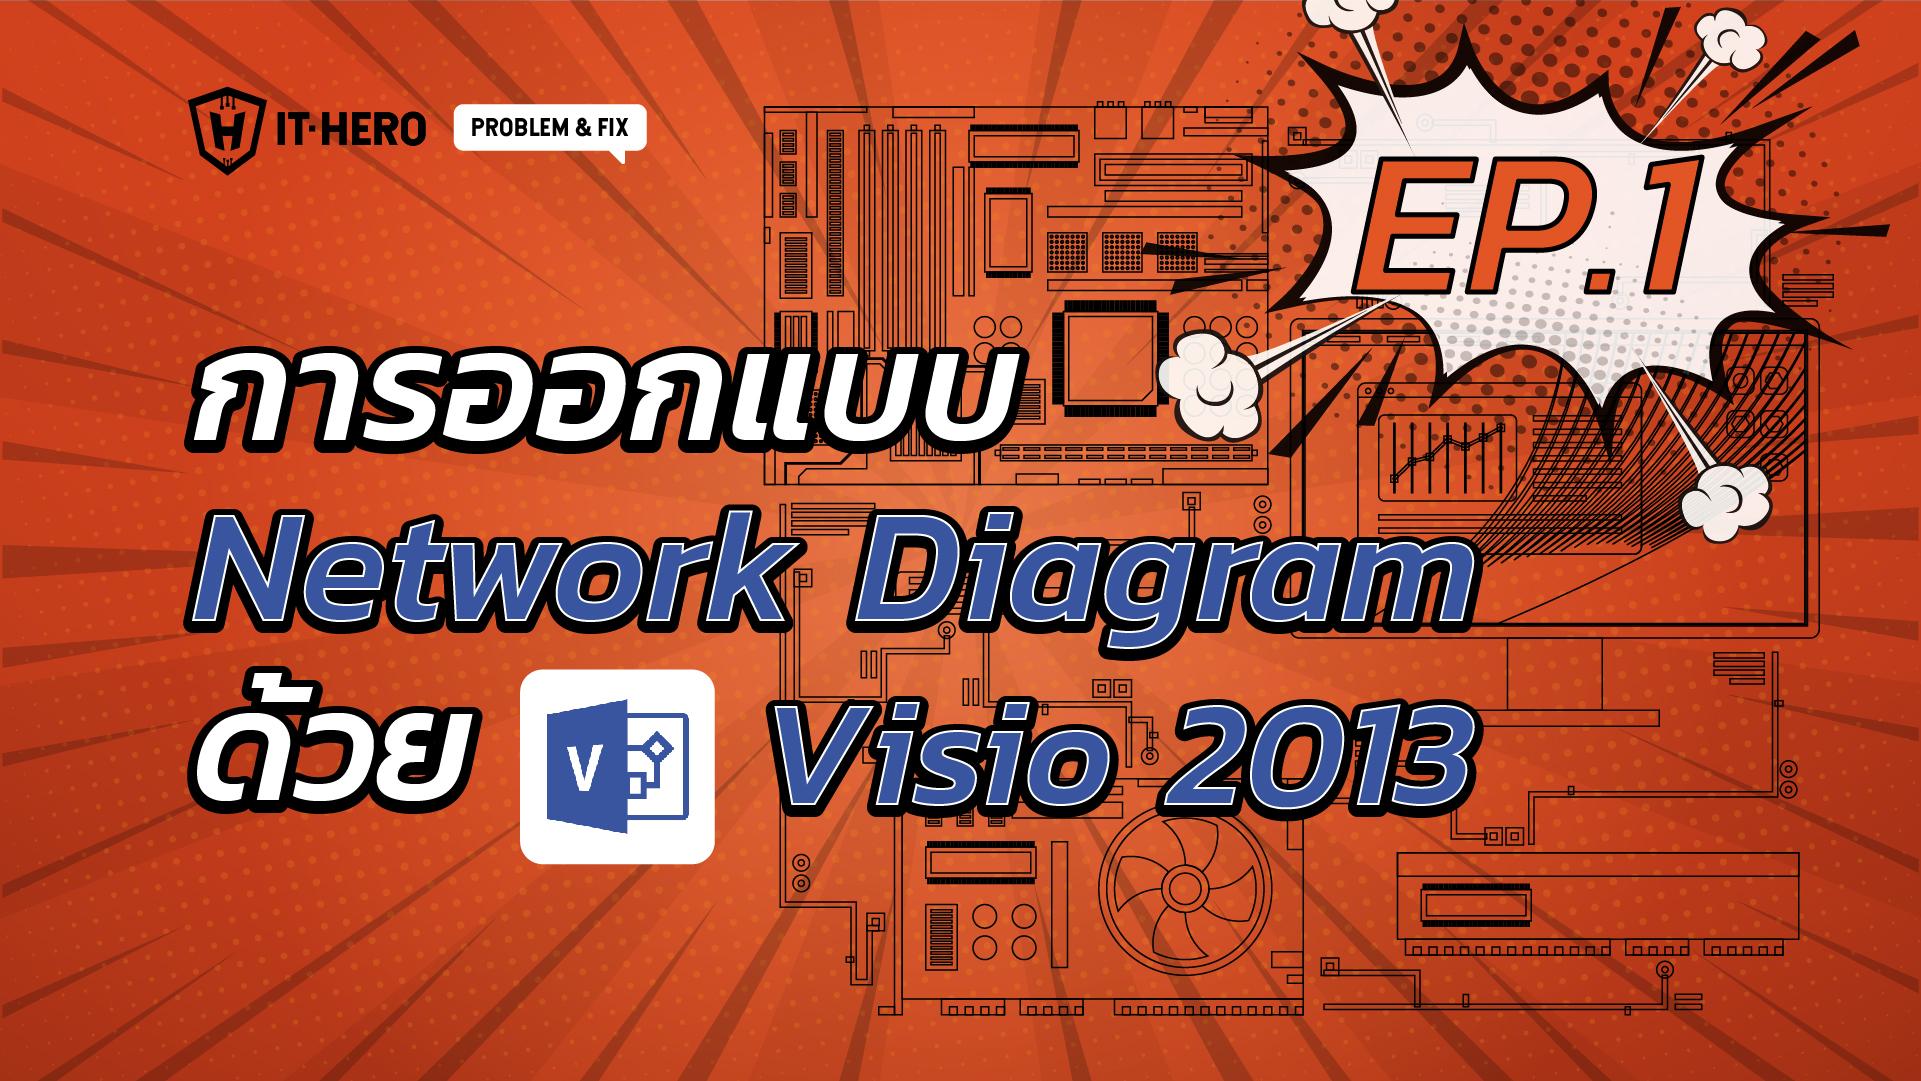 Trick การออกแบบ network diagram ด้วยโปรแกรม Visio